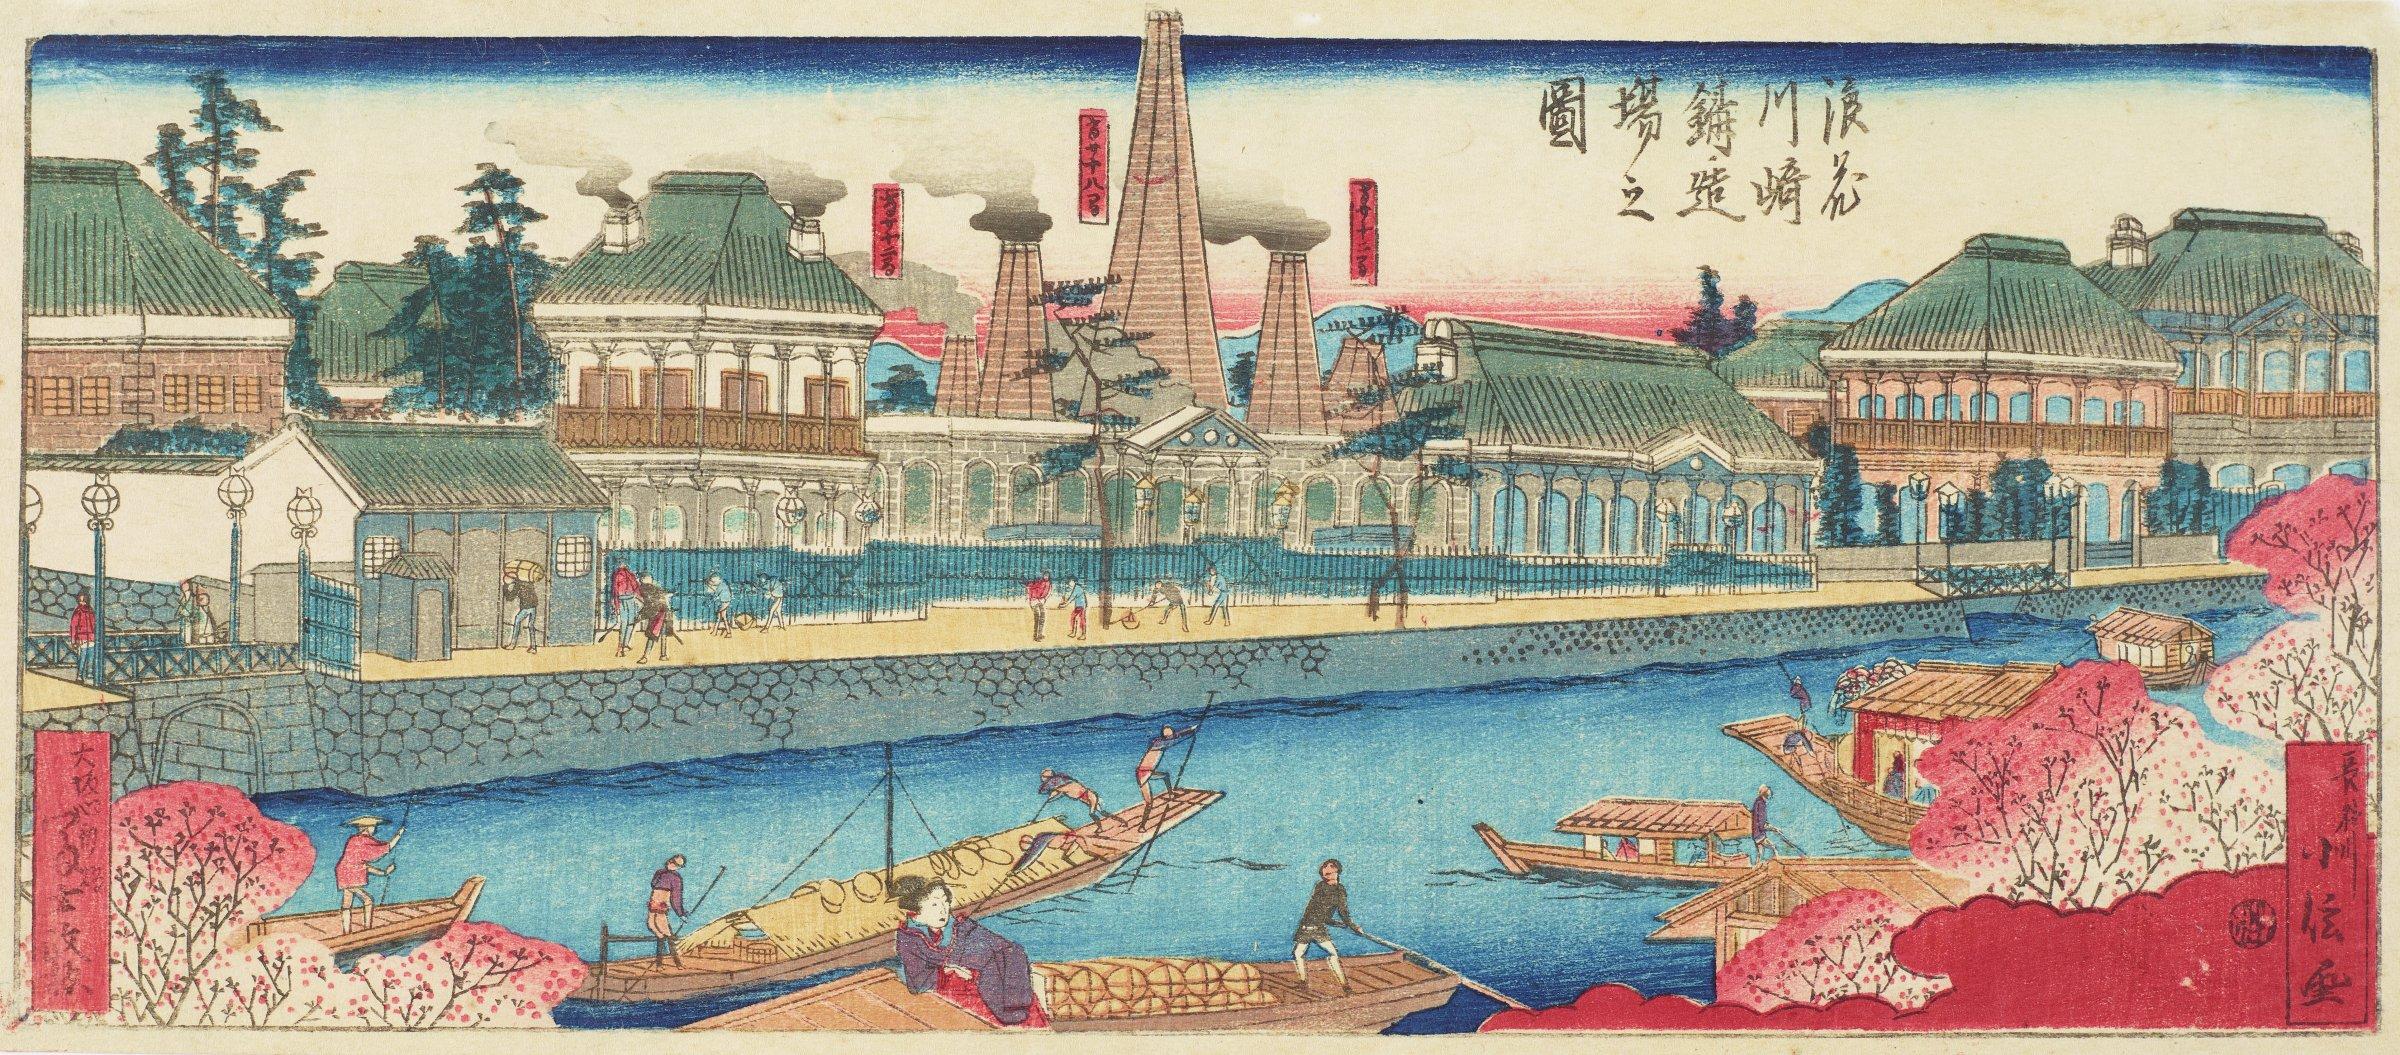 A View of the Kawasaki Ship-Yard, Utagawa Konobu I, ink and color on paper